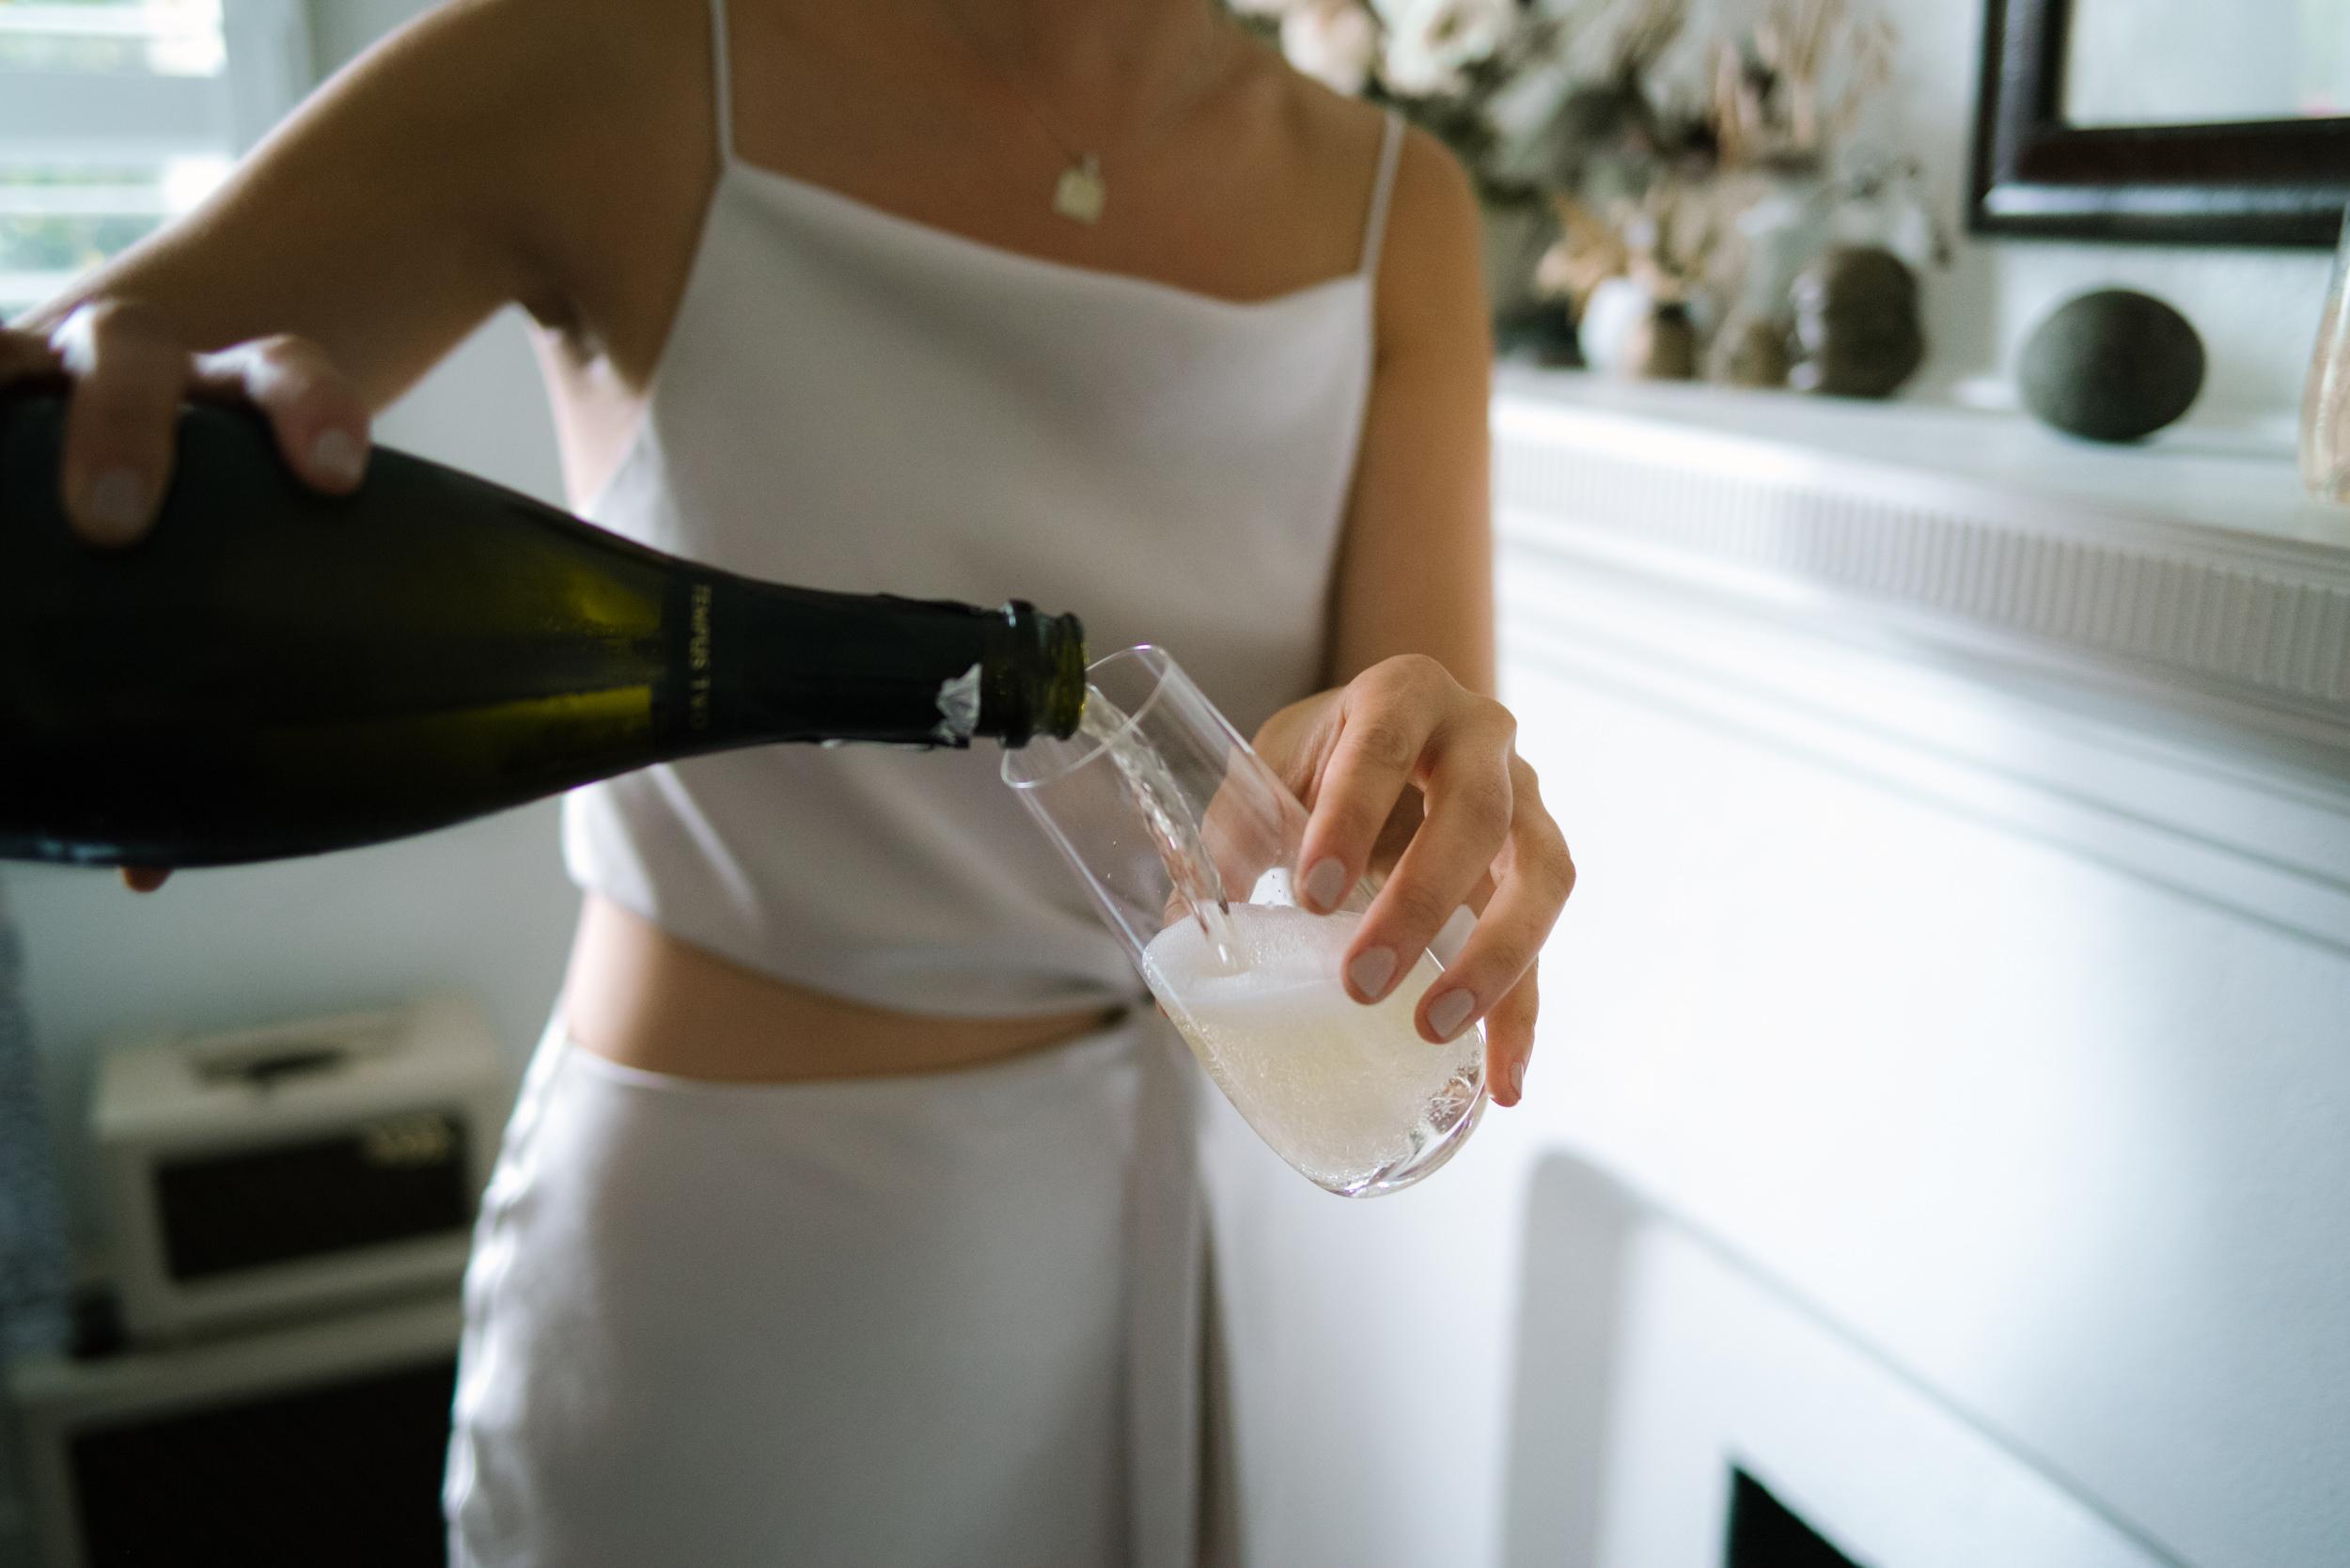 I-Got-You-Babe-&.Co.-Glasshaus-Wedding-Charlotte-Cameron0019.JPG